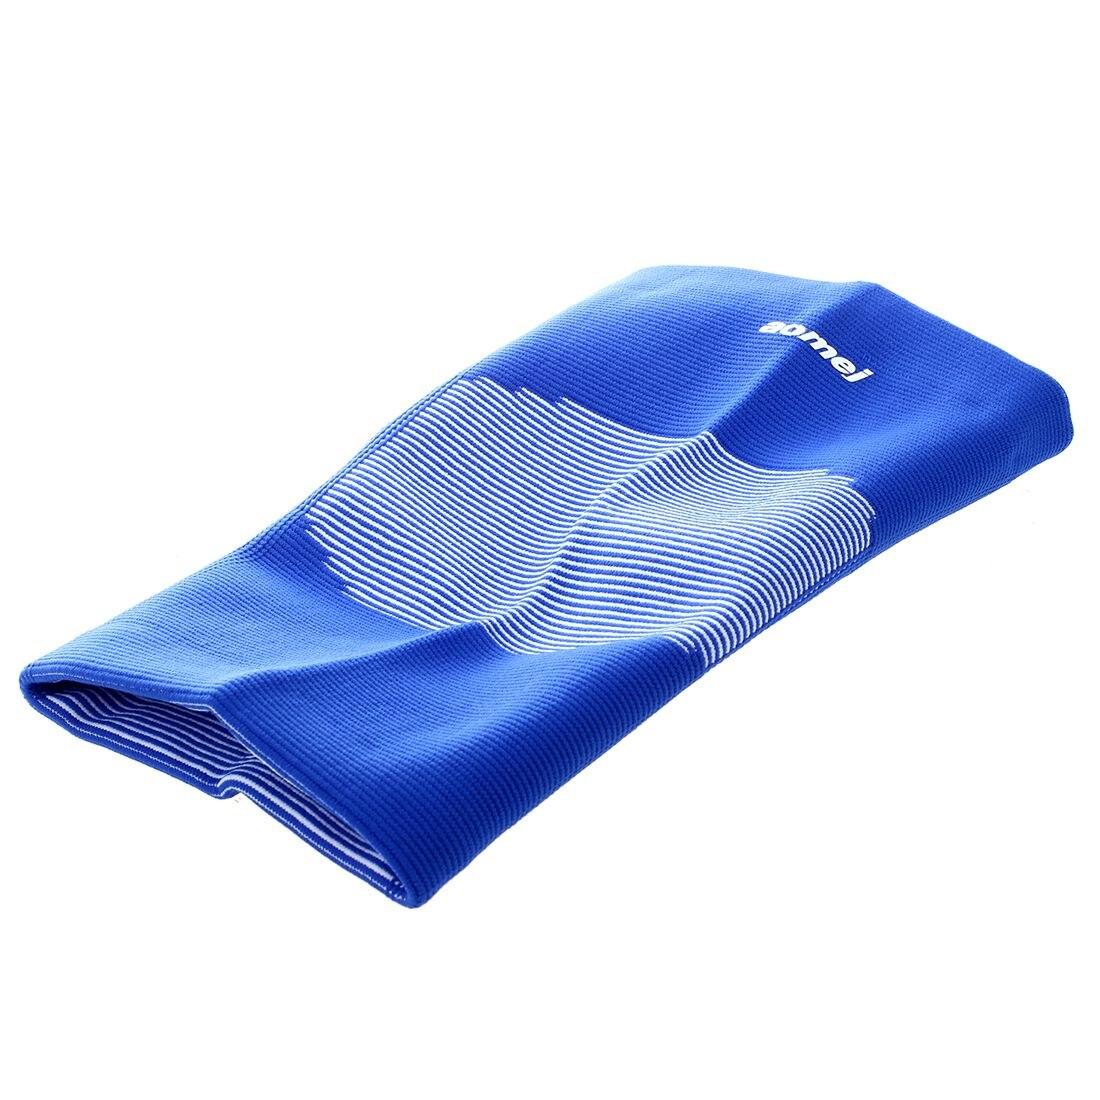 MOOL White Stripes Blue Elastic Knee Sleeve Support Brace